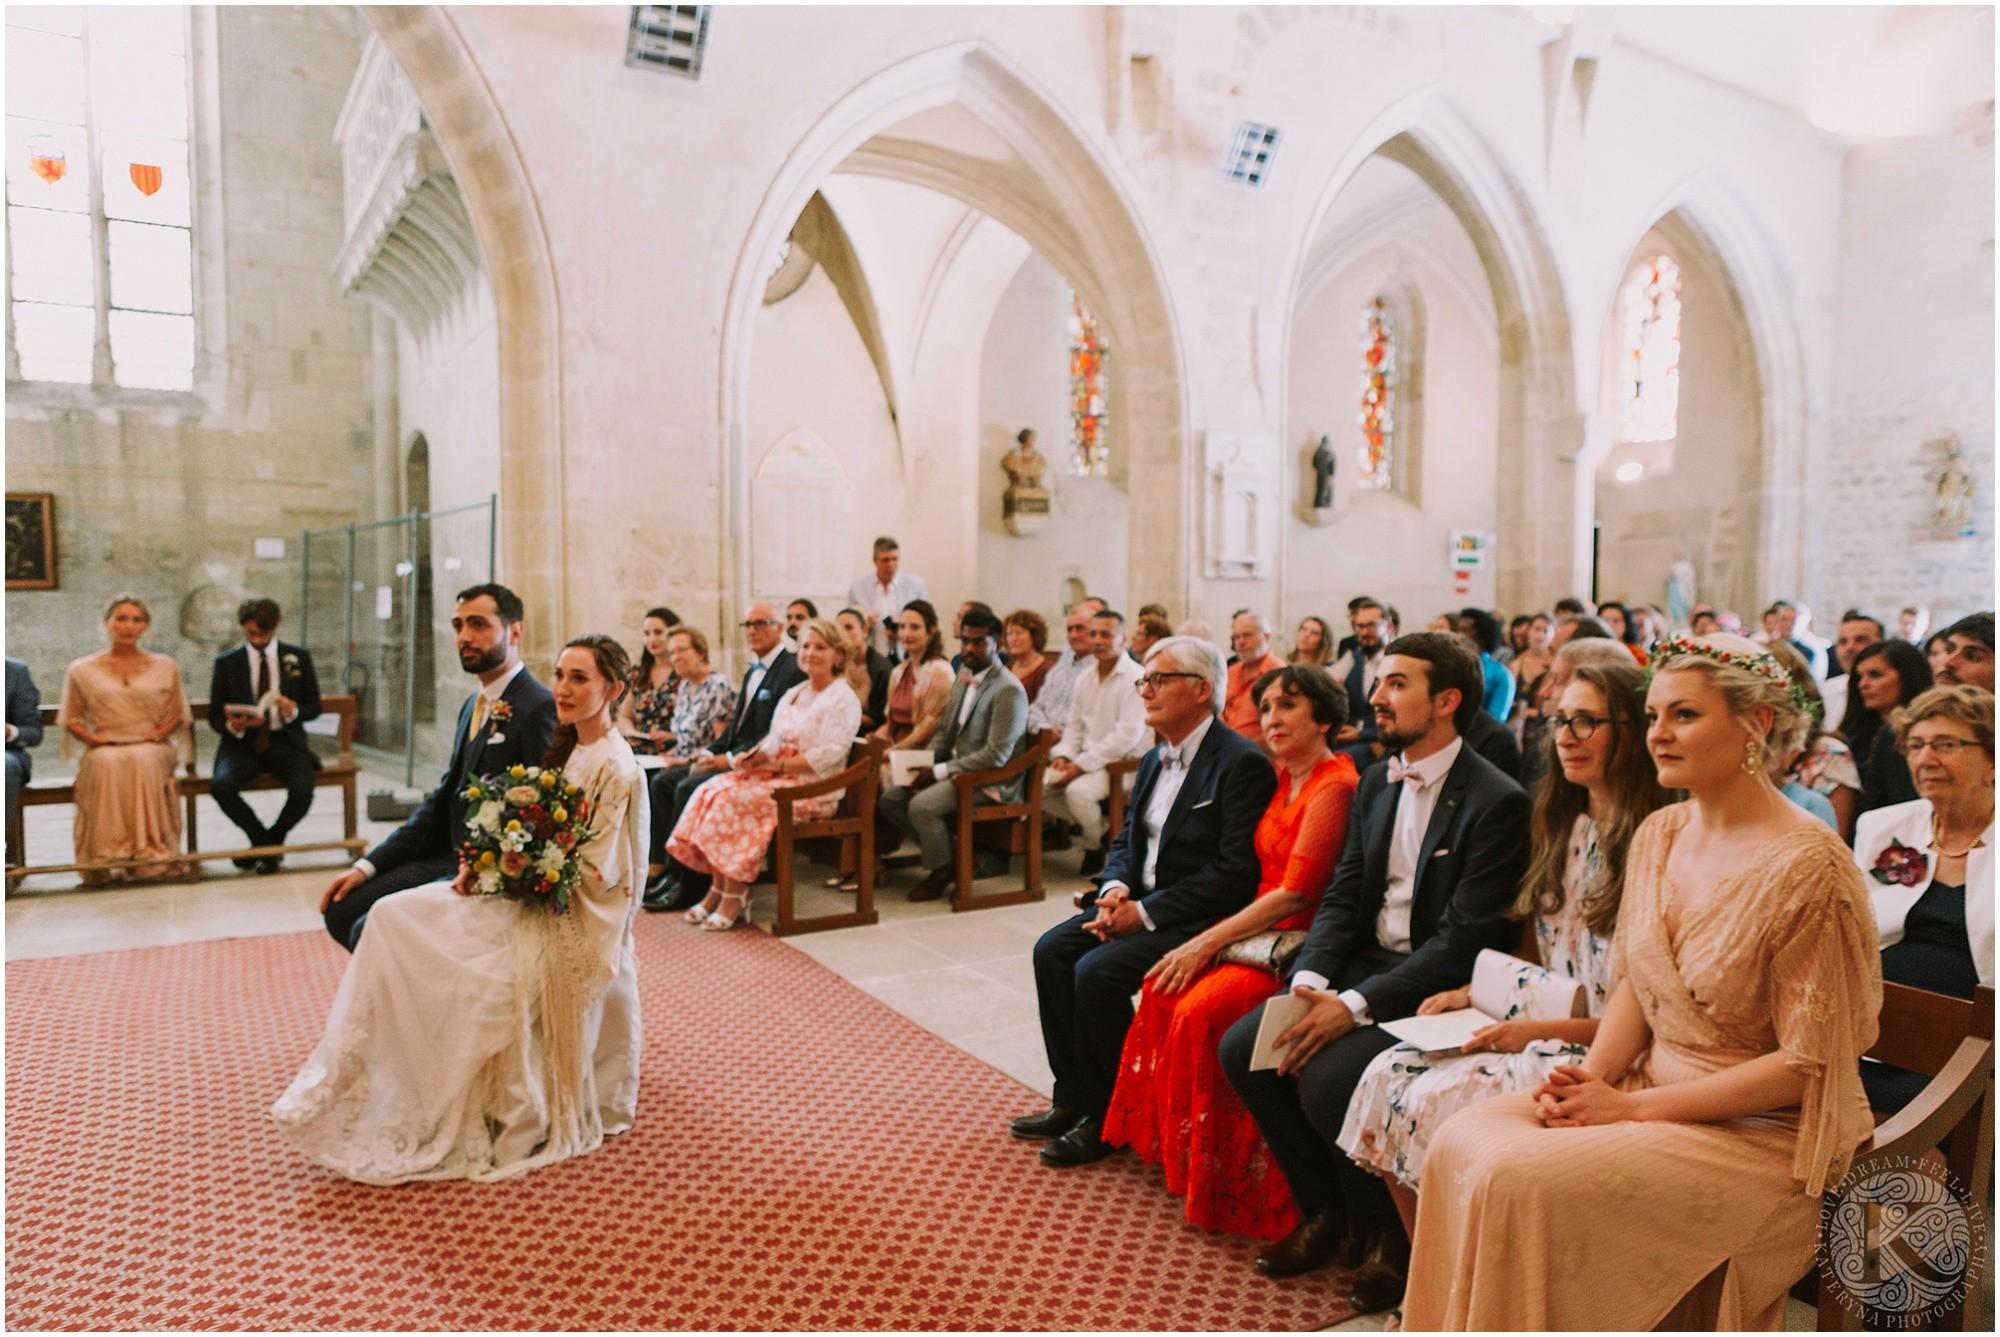 Kateryna-photos-photographe-mariage-vaucluse-provence-avignon-ferme-st-hugues_0030.jpg